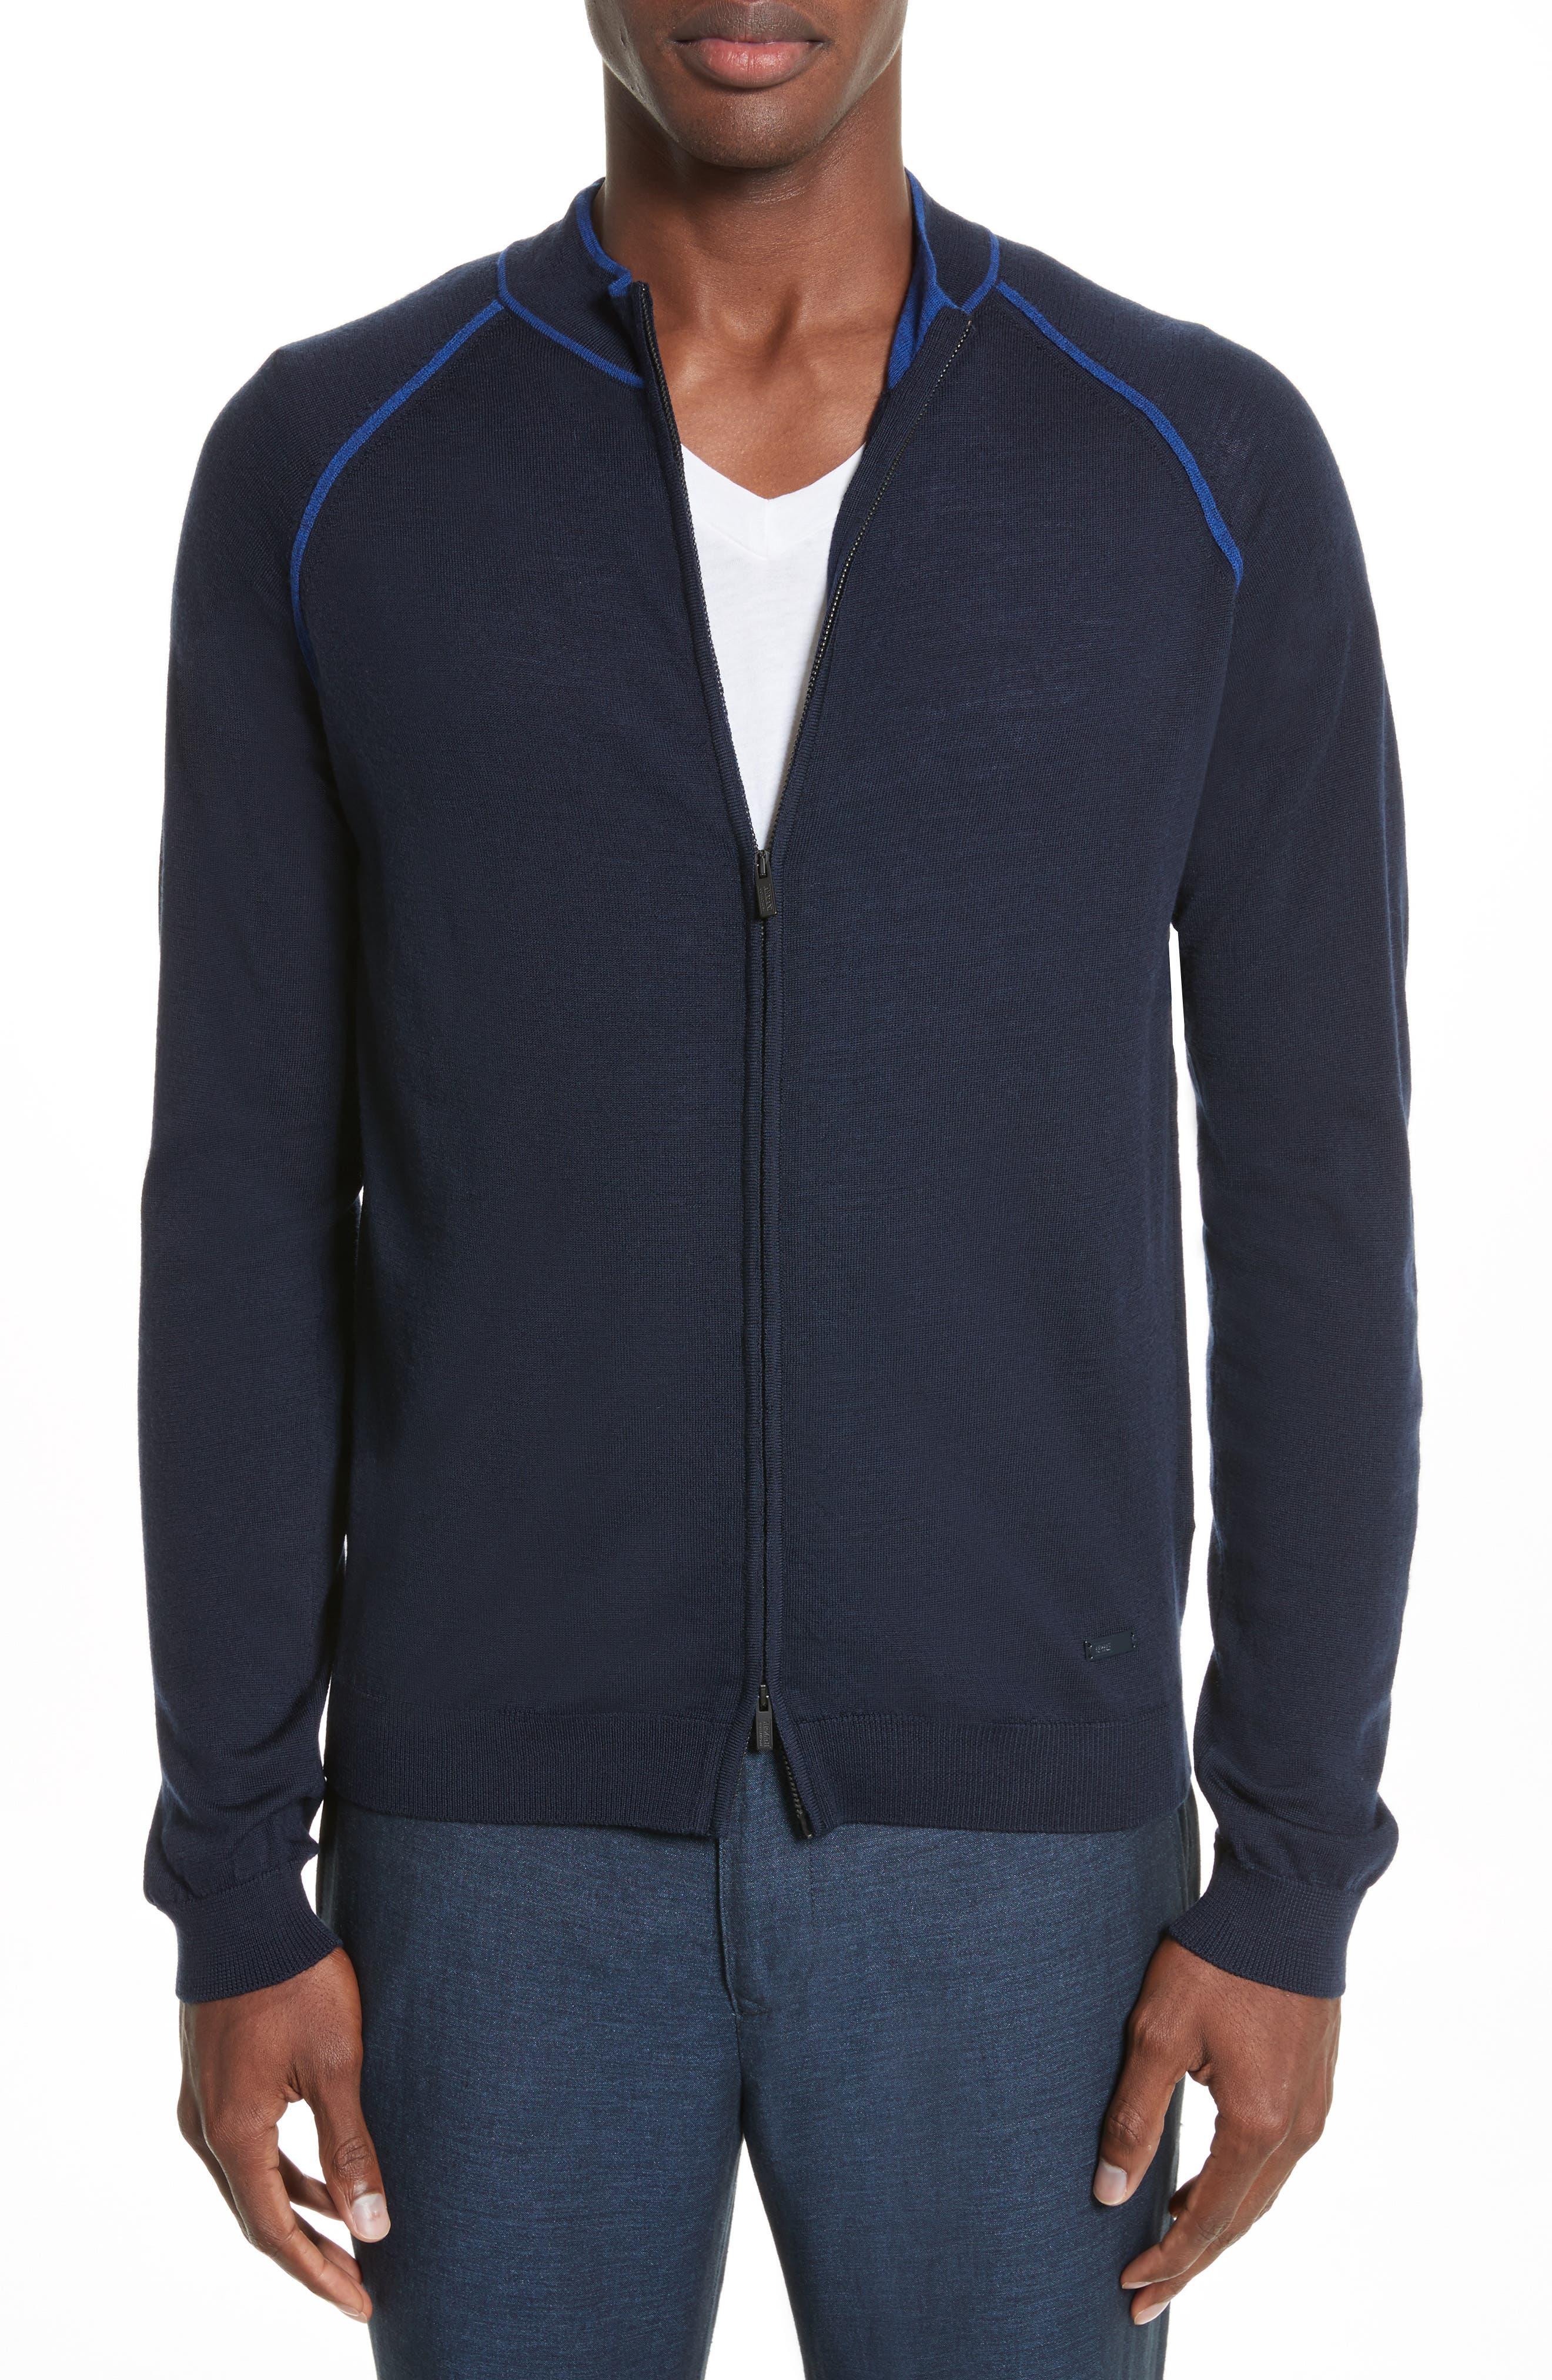 Alternate Image 1 Selected - Armani Collezioni Zip Front Raglan Sweatshirt